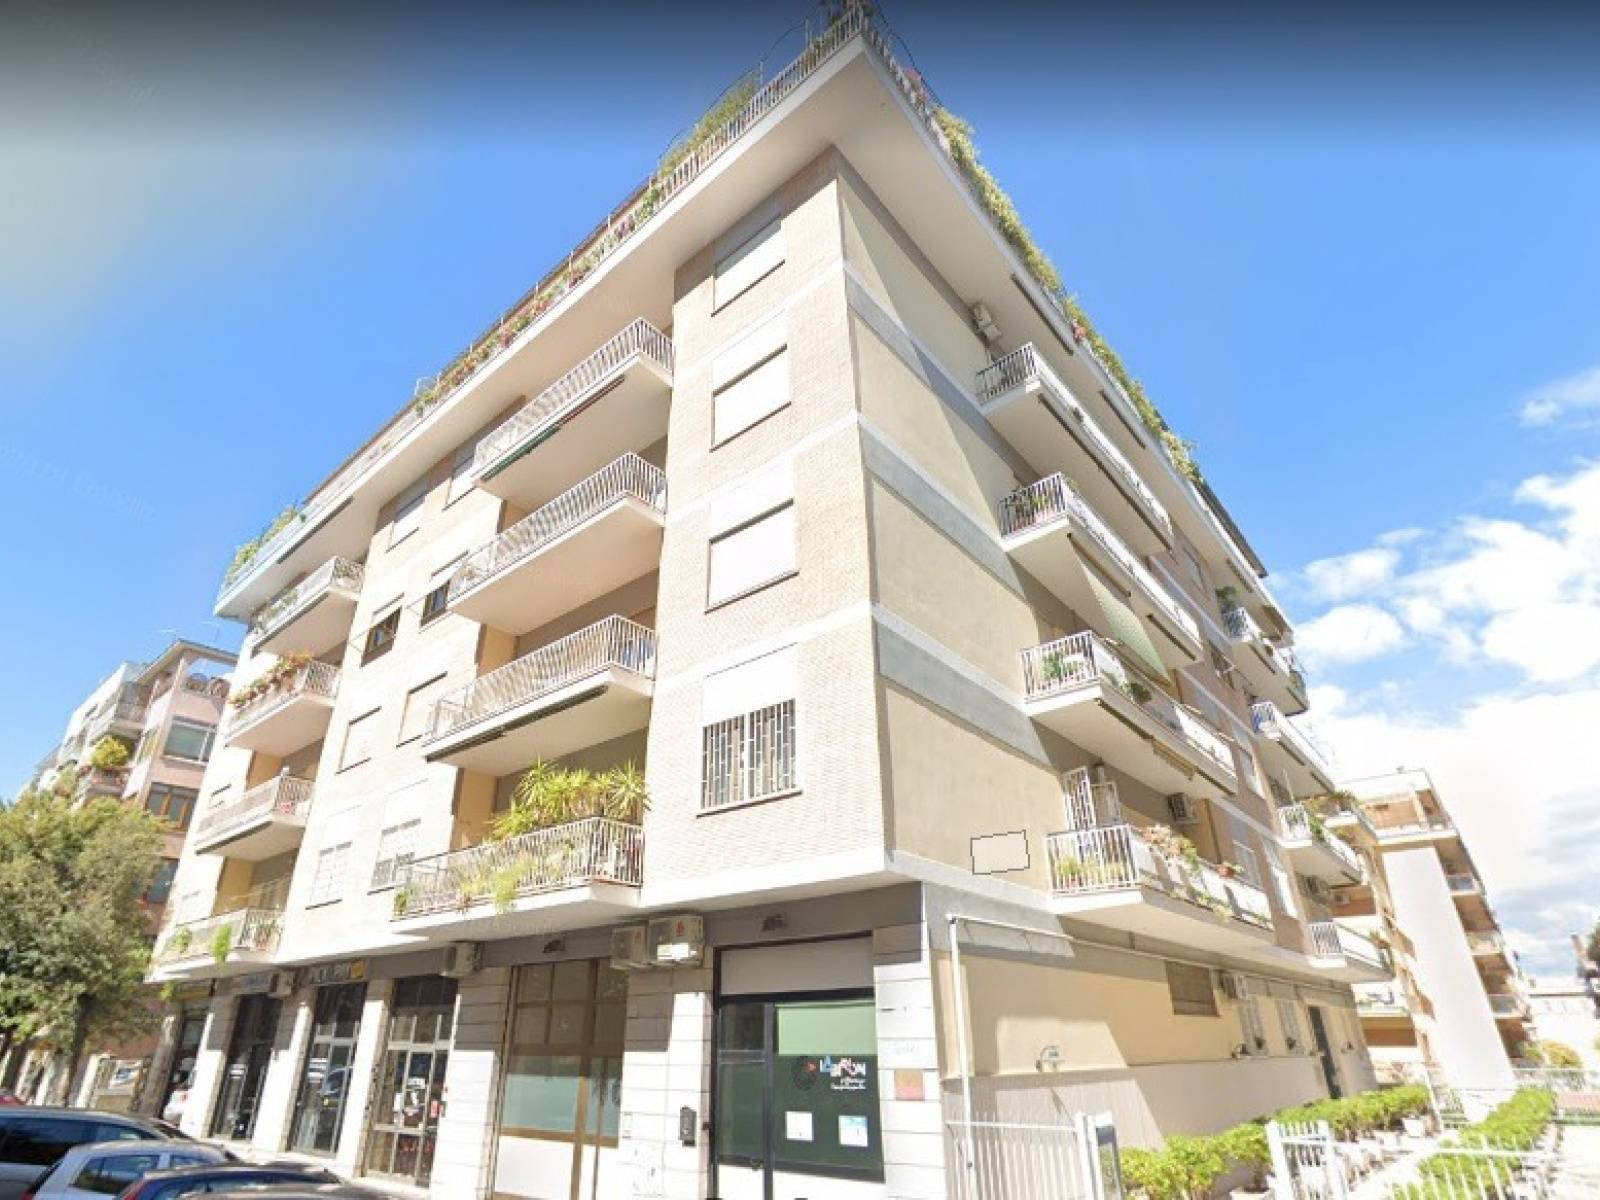 1118418060 Bilocale in Via Bellegra, Roma, Zona Villa Gordiani